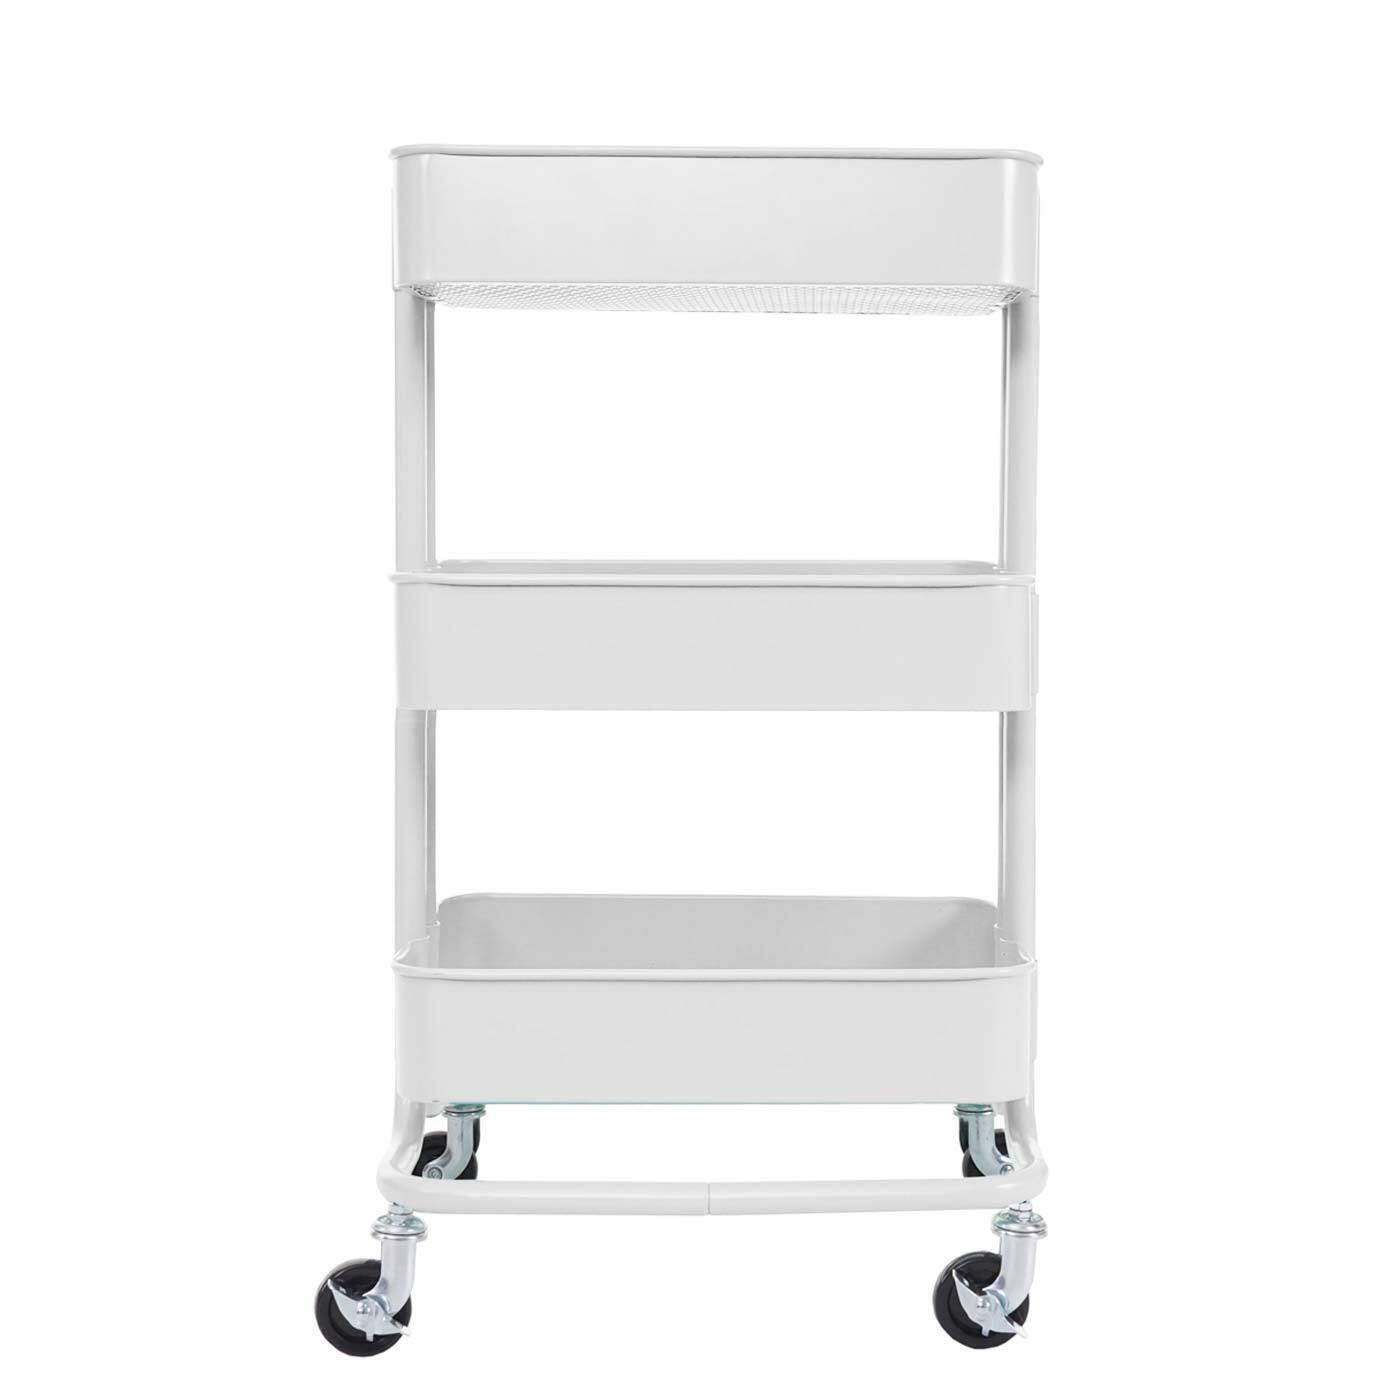 B-Ware Serving Trolley MCW-C64, Kitchen Trolley Bar Cart 79x44x37cm White